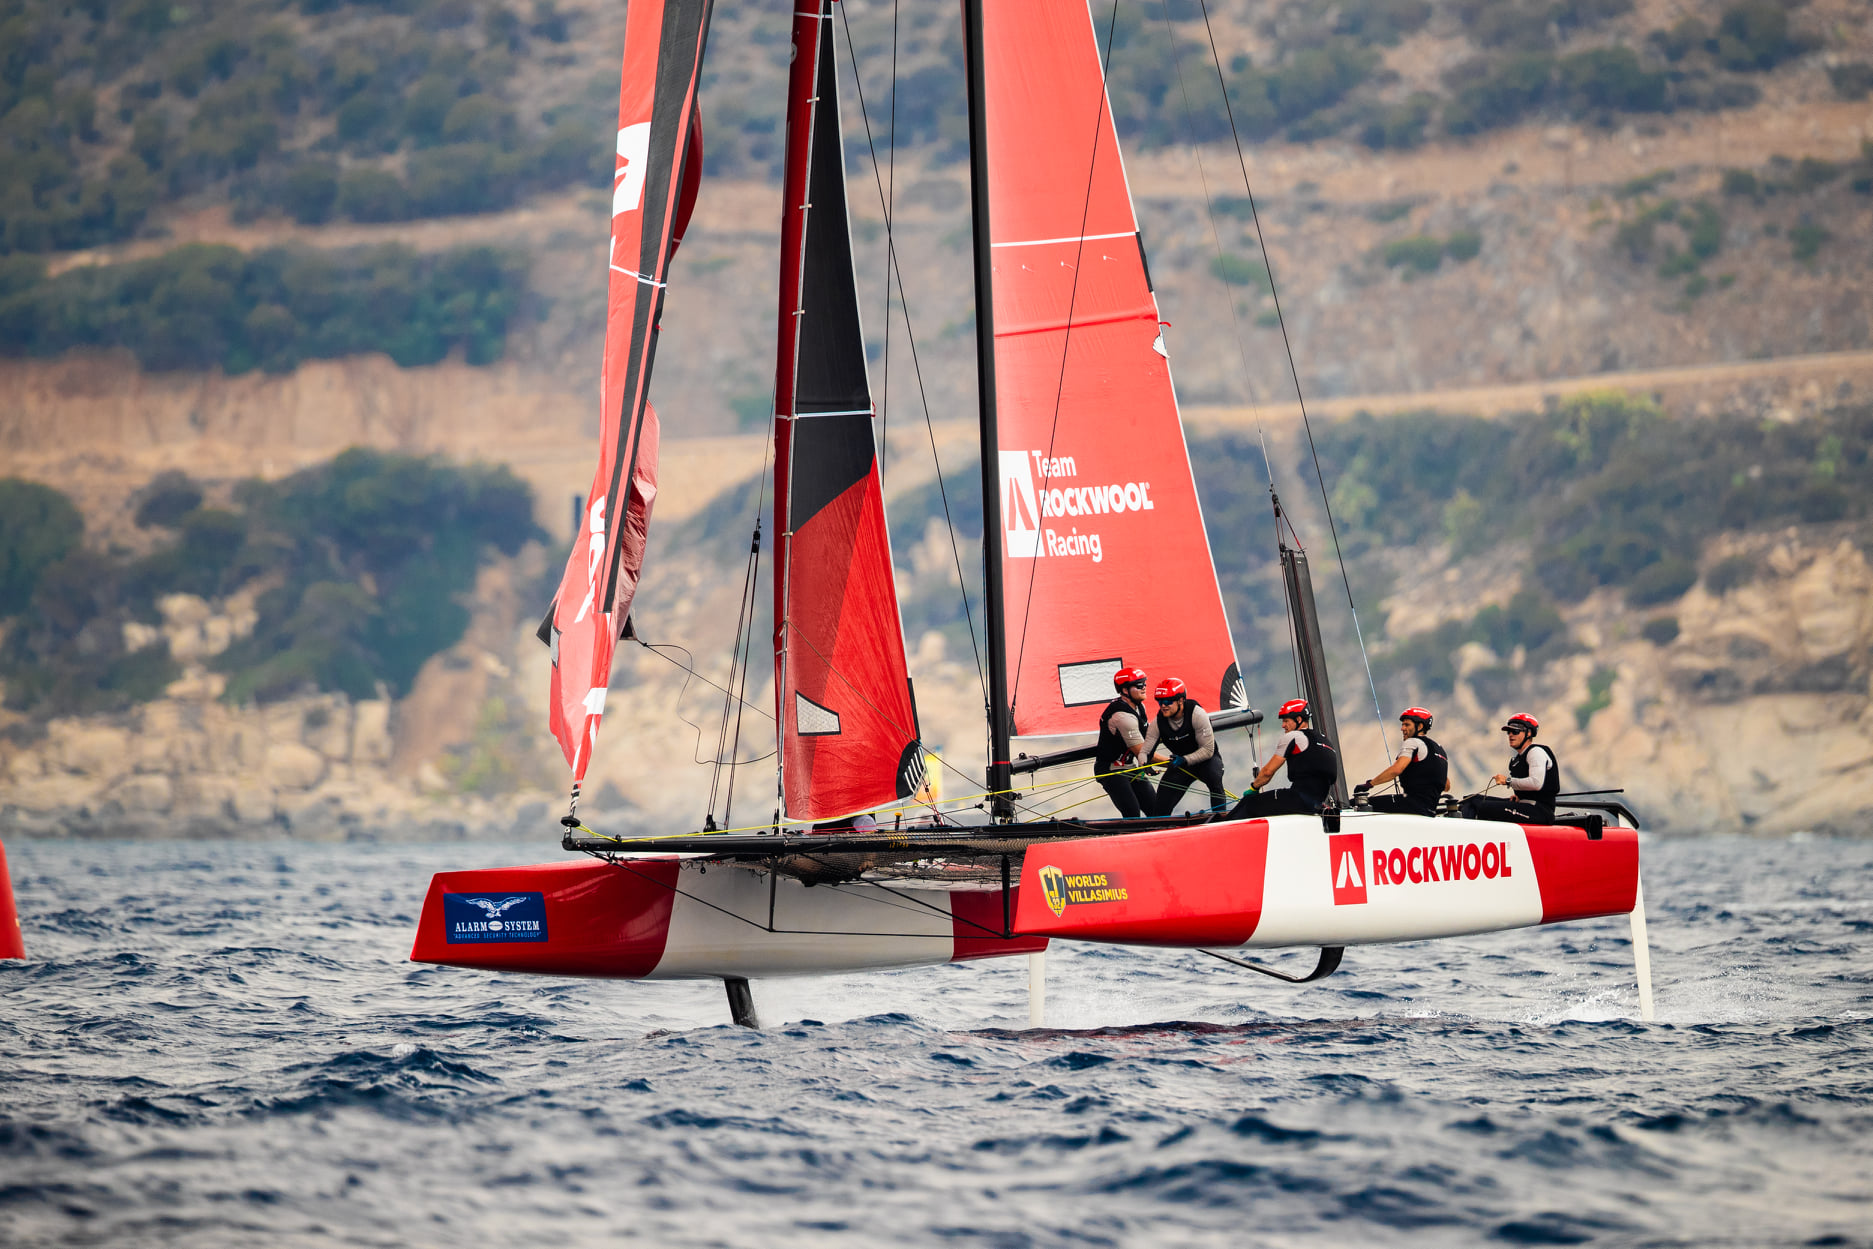 Team Rockwool Racing on foils, sailing on a reach.